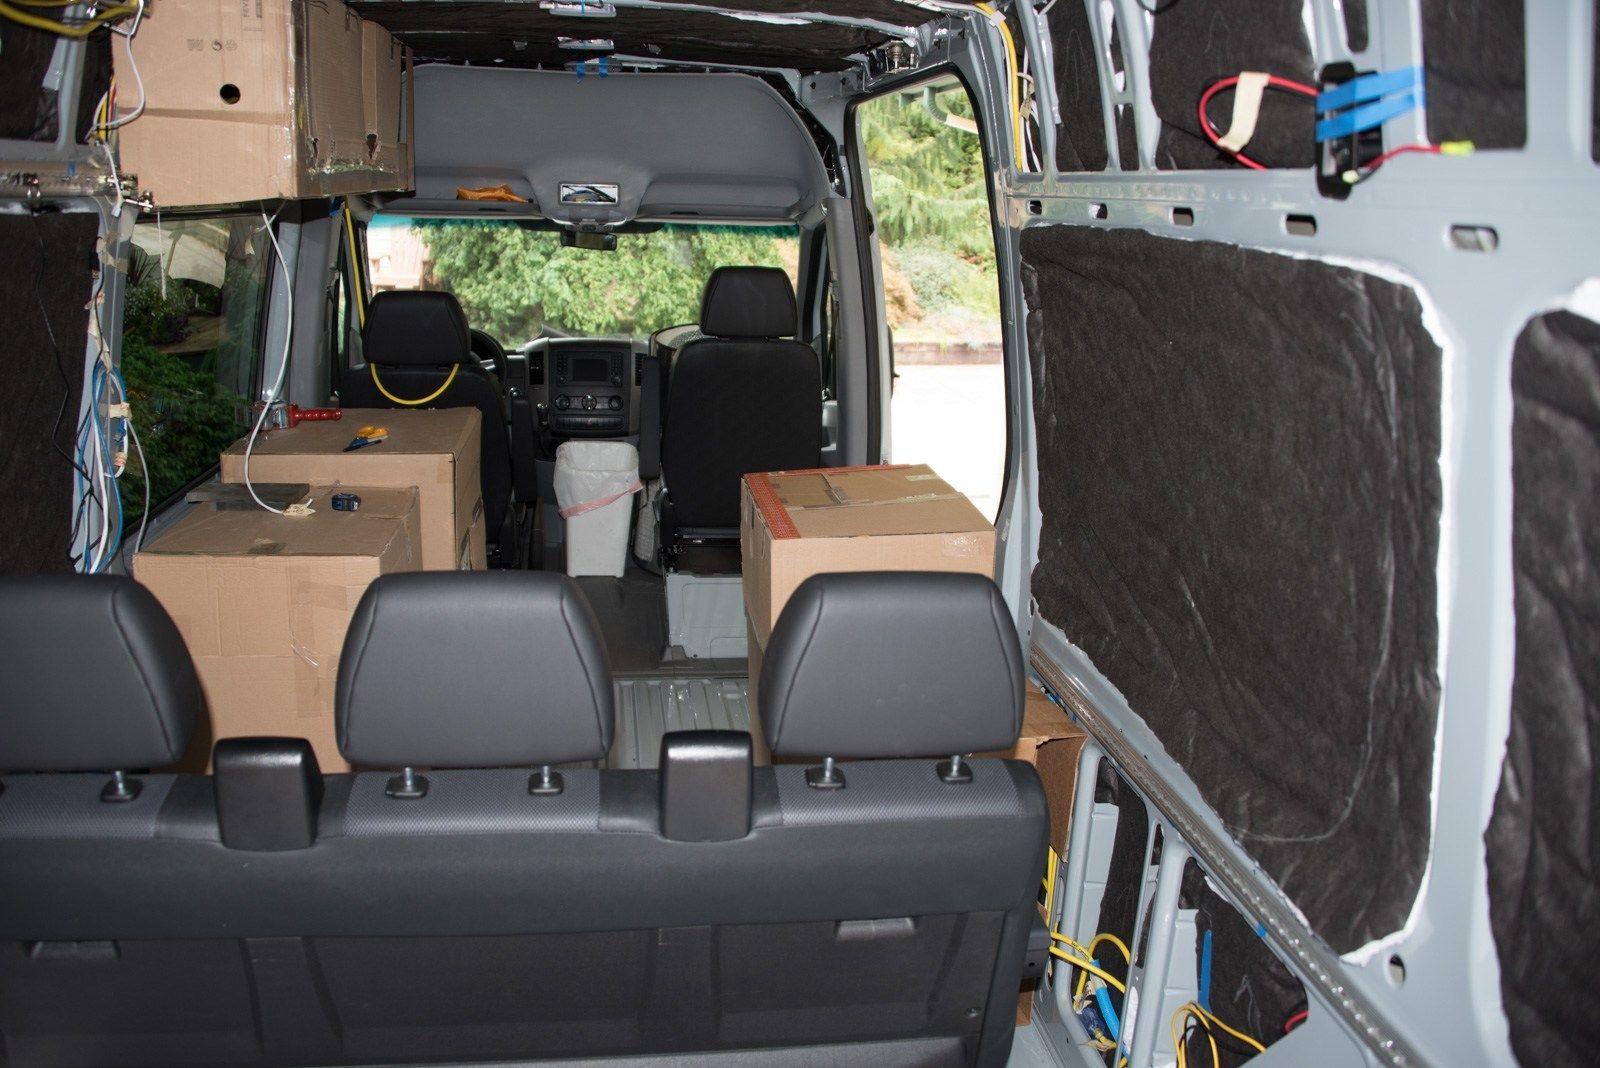 Mocking up locations Mocking, Camper van, Car seats